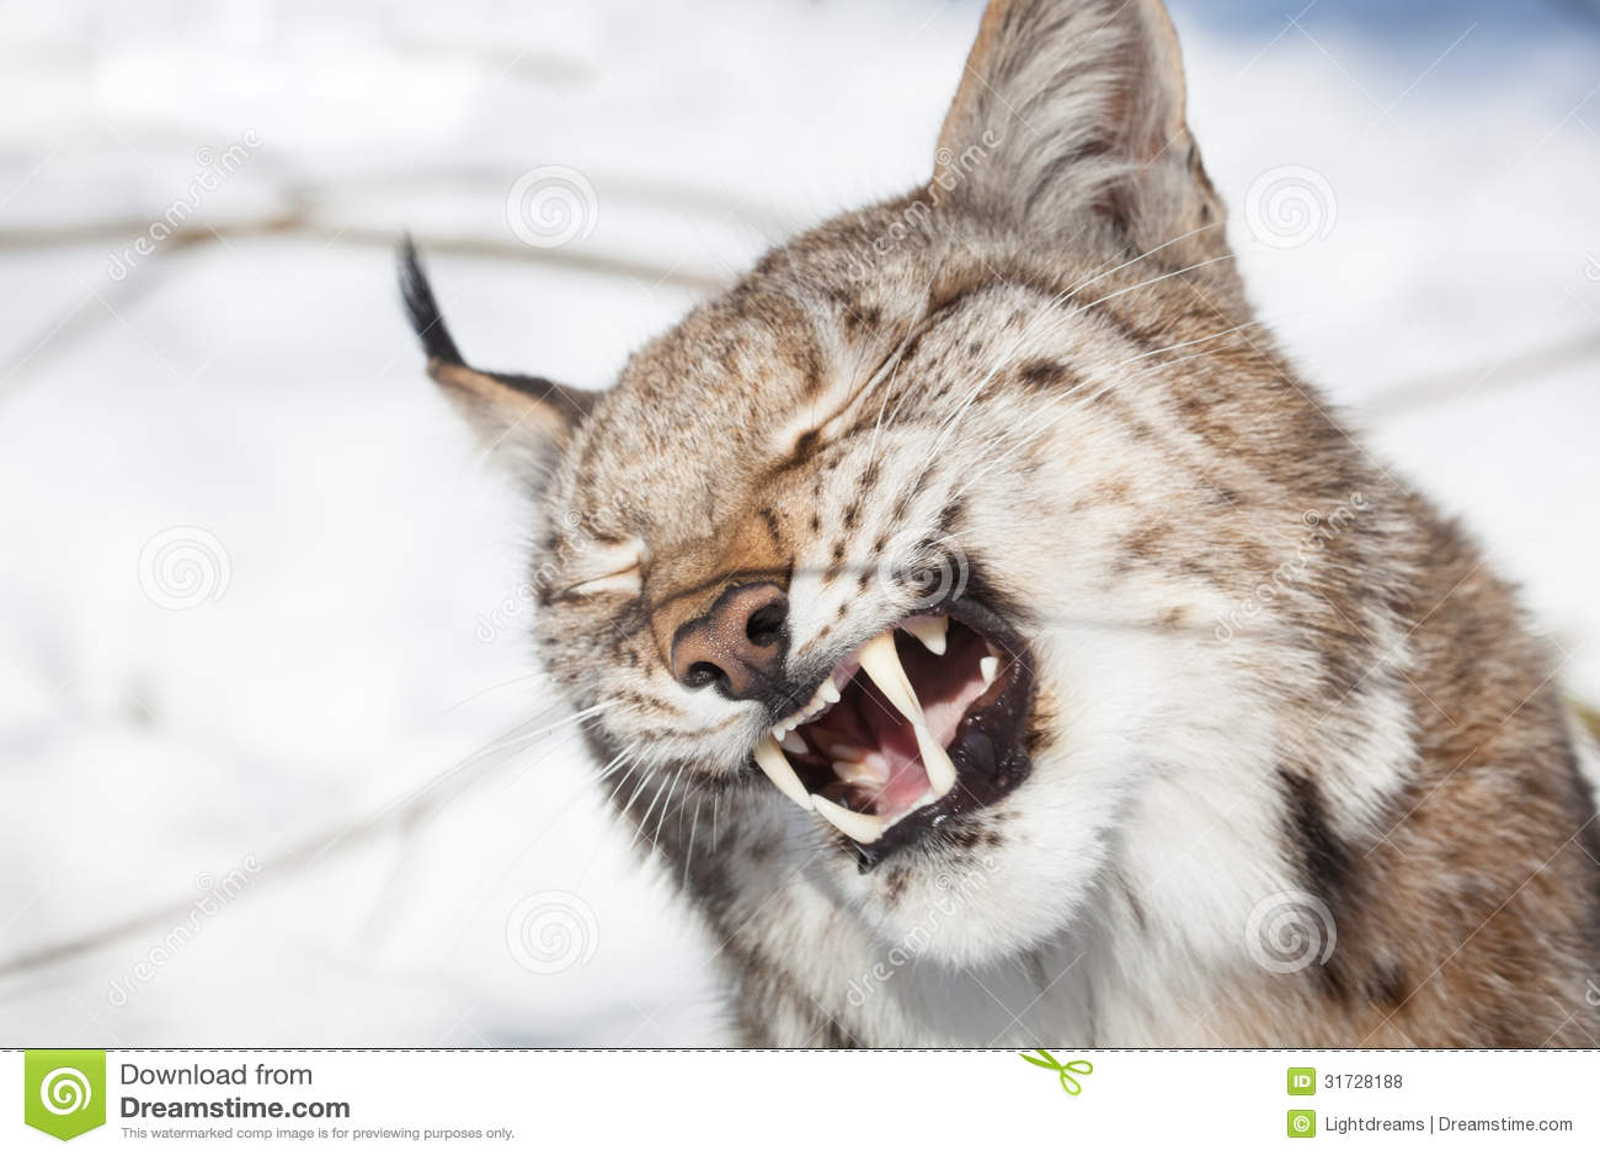 Lynx Portrait Royalty Free Stock Photos Image 31728188